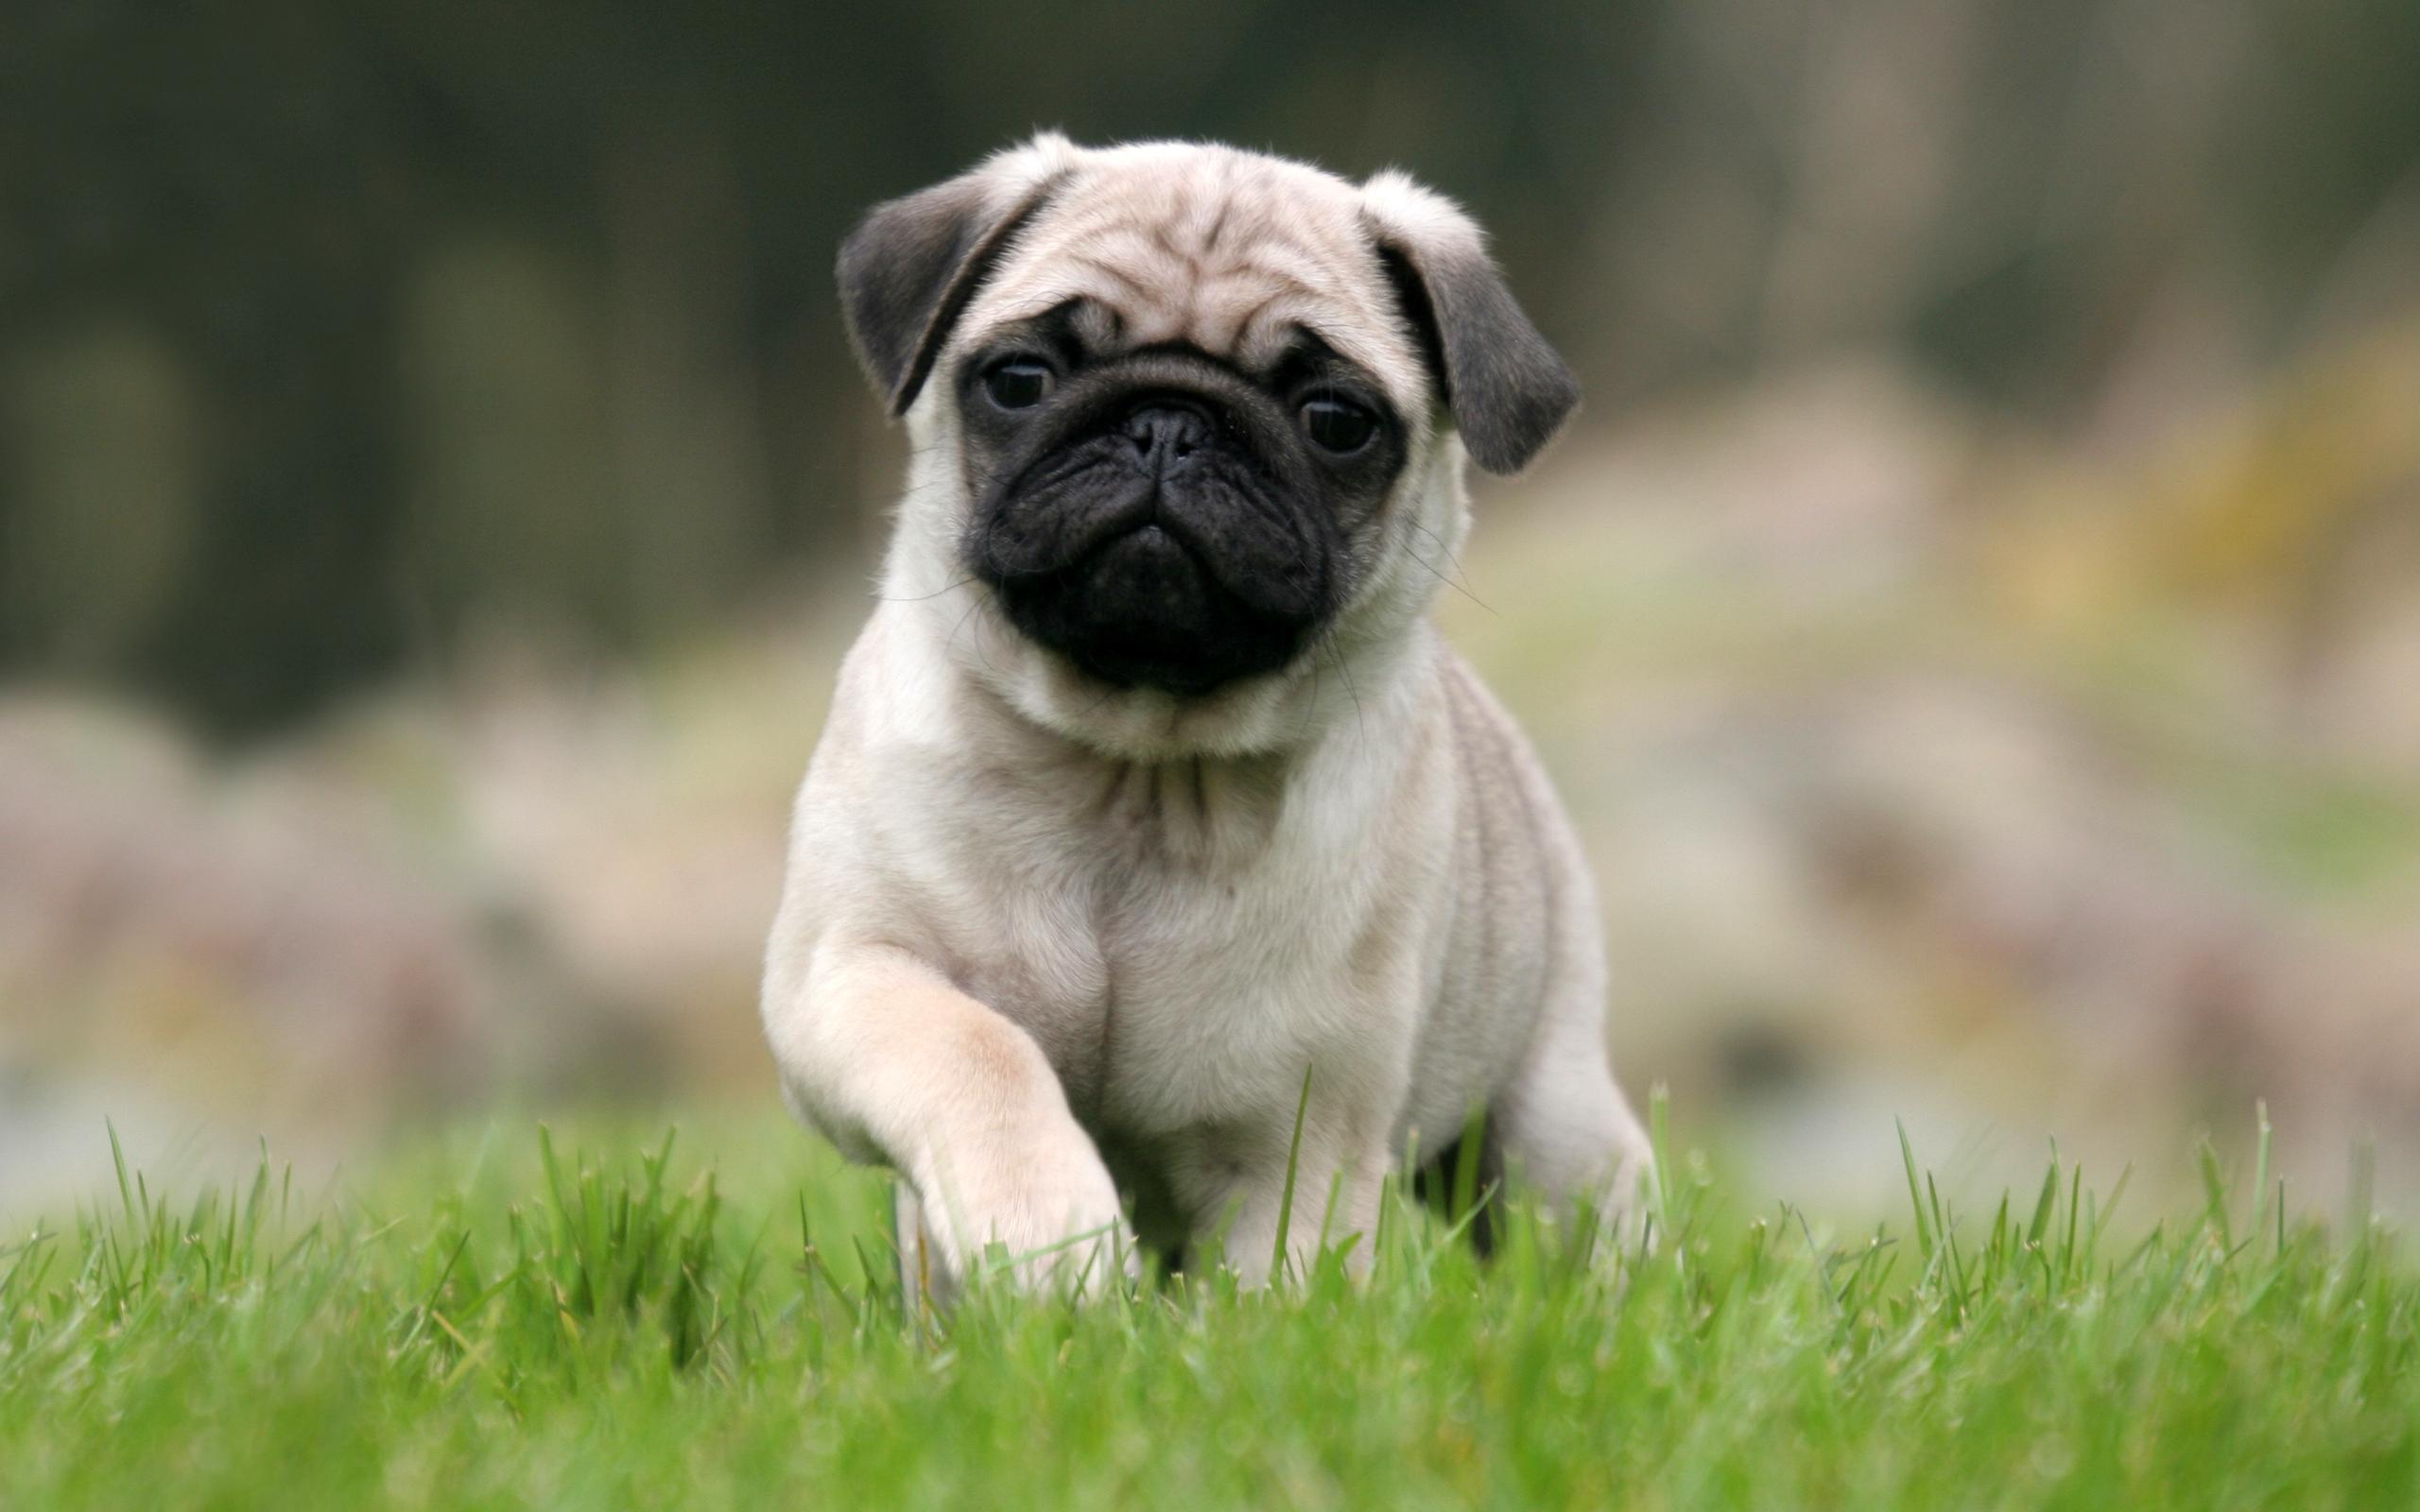 Pug - Small Dog Breeds